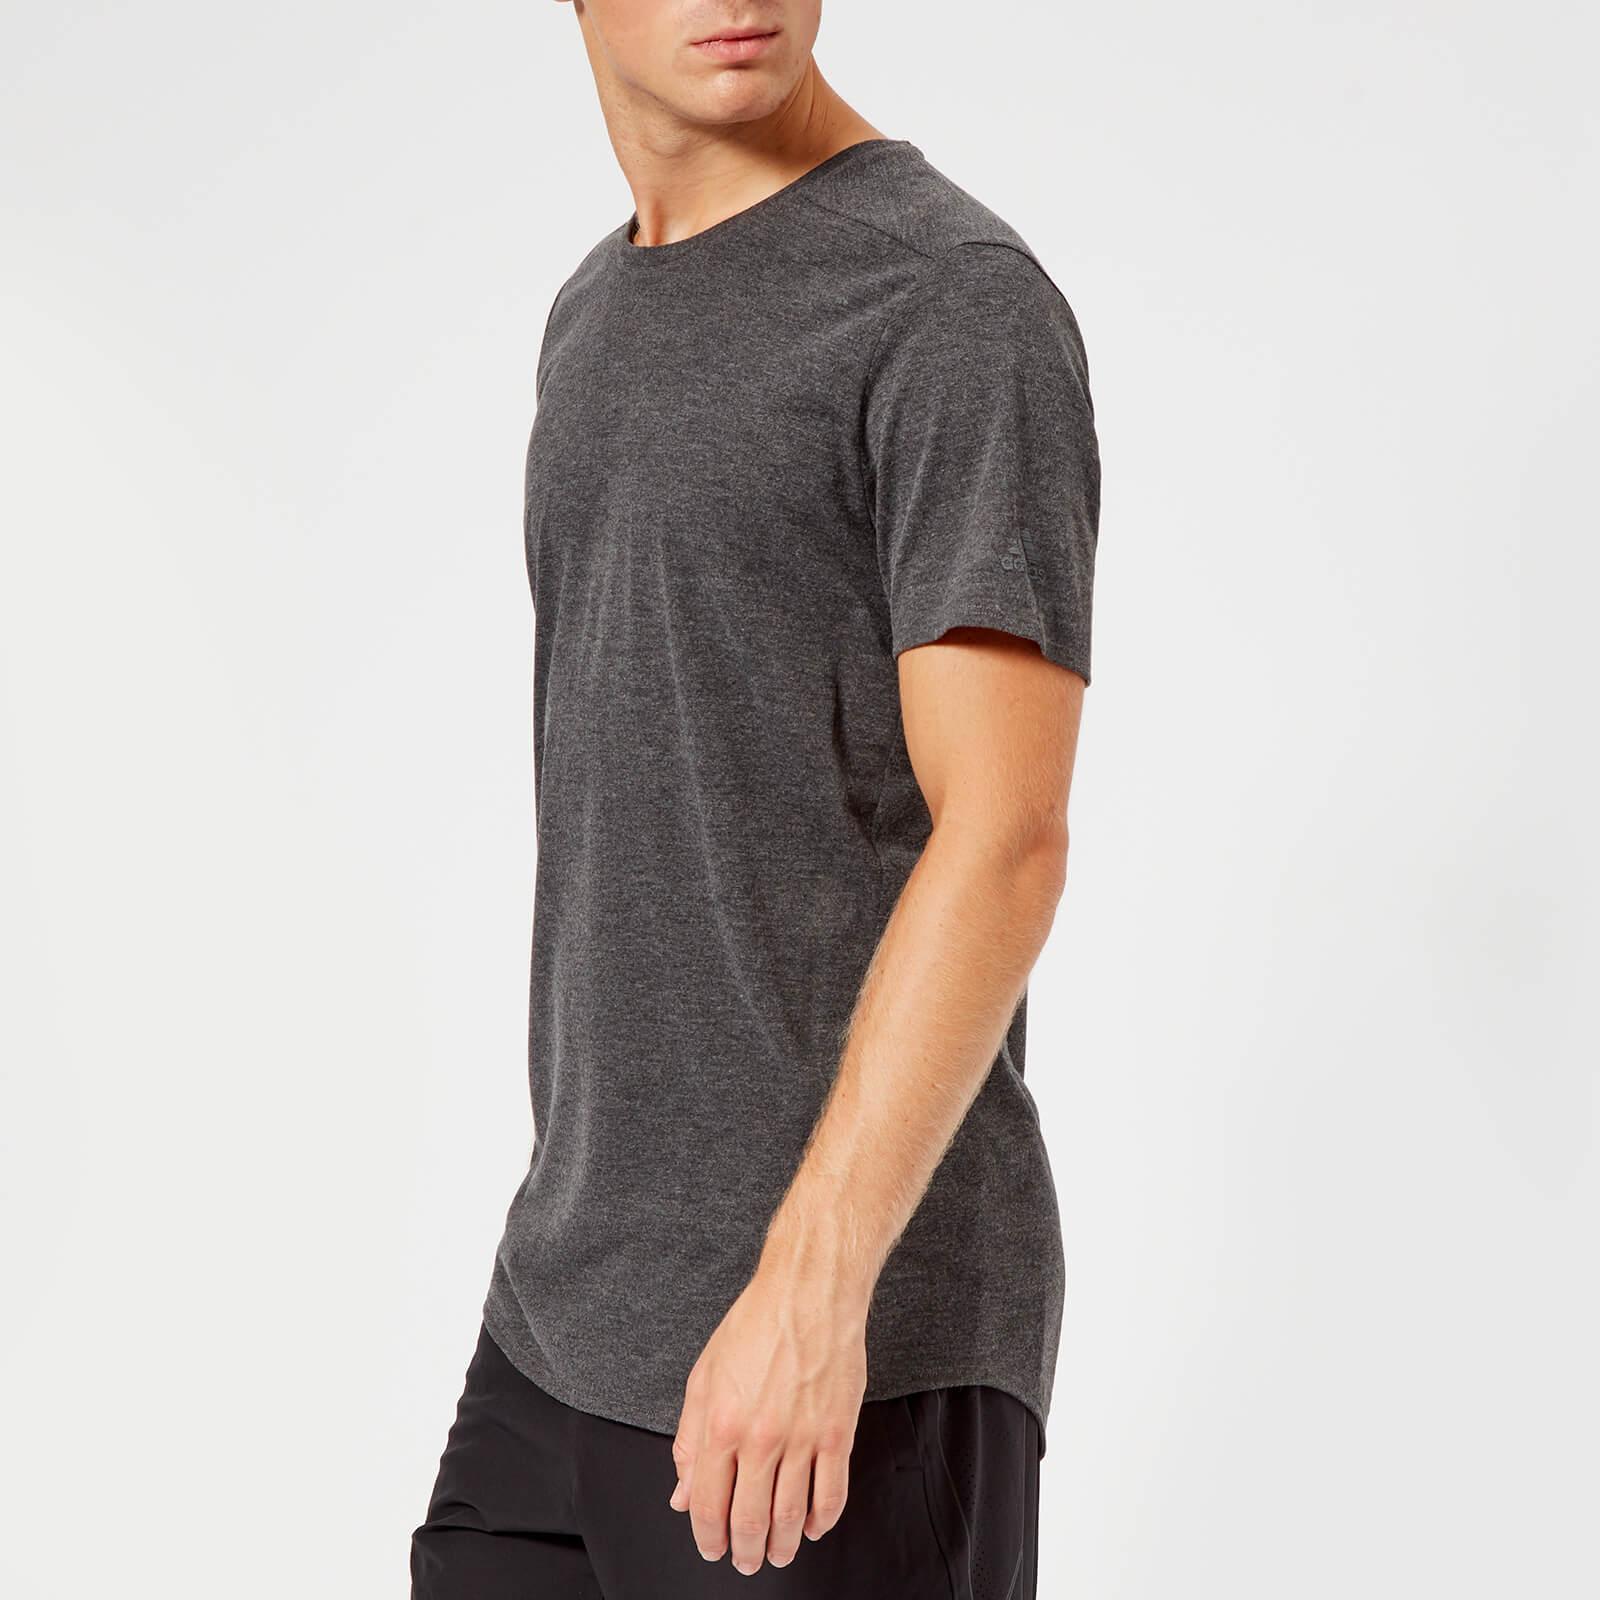 514fc54bdc13 adidas Men s Supernova Pure Running T-Shirt - Grey Sports   Leisure ...